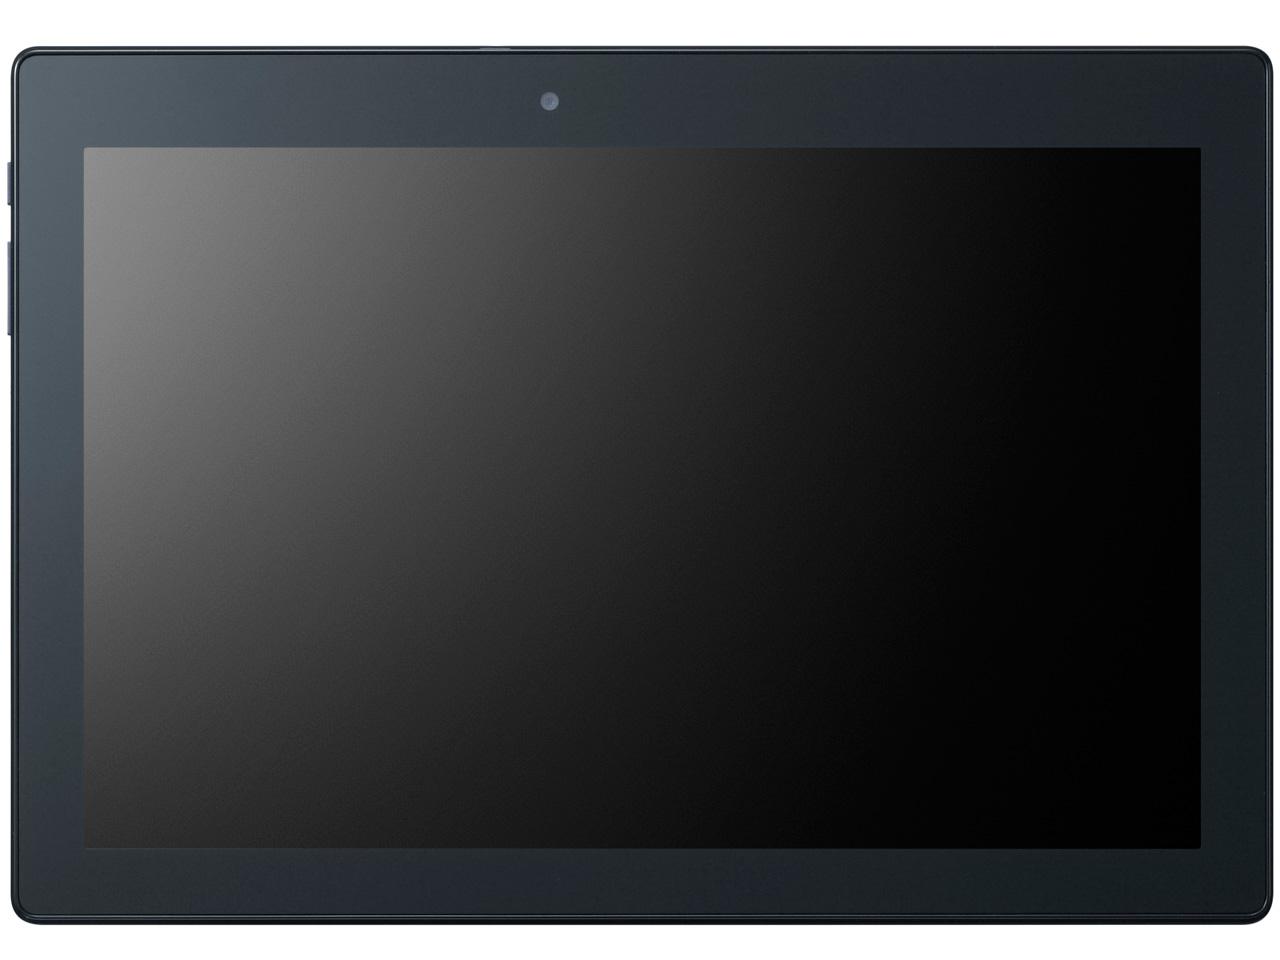 『本体 正面』 LAVIE Tab E TE510/BAL PC-TE510BAL の製品画像